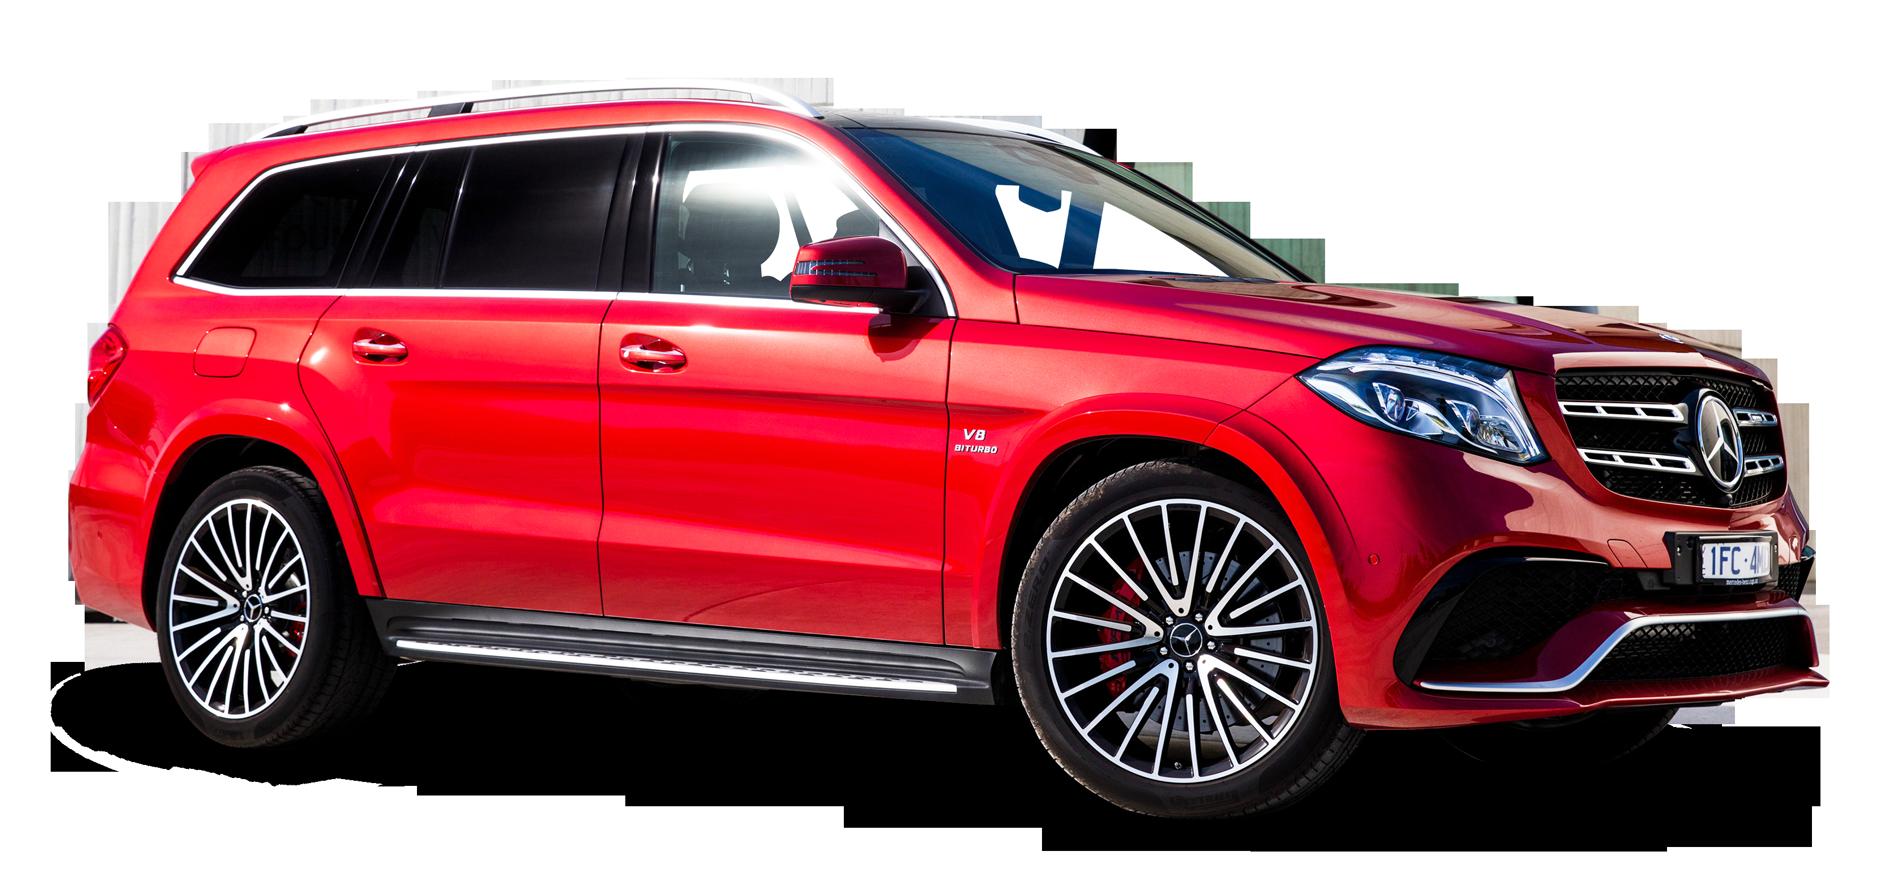 Red Mercedes Benz GLS Class Car PNG Image